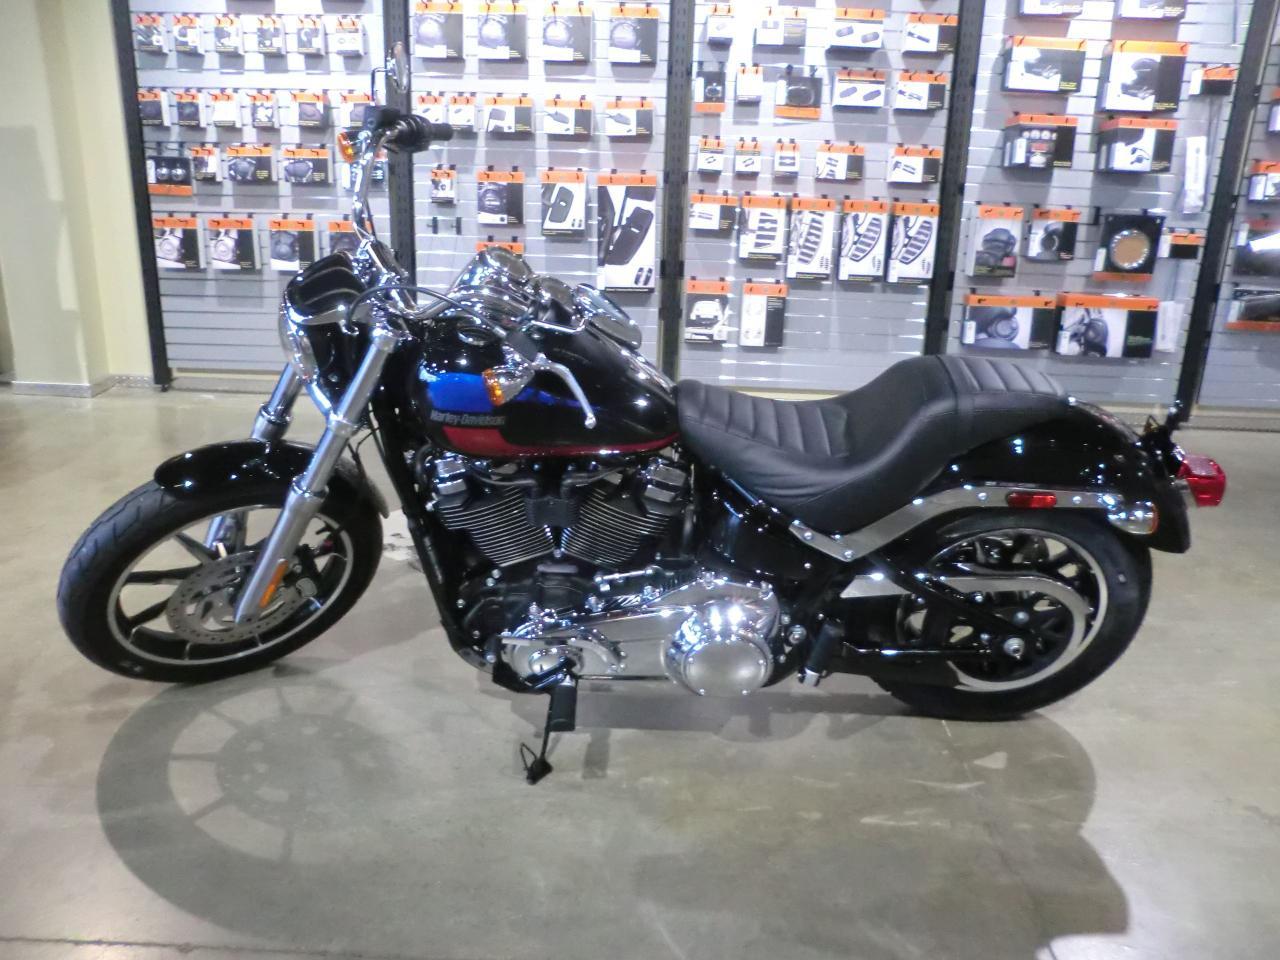 2019 Harley-Davidson FXR FXLR LOW RIDER